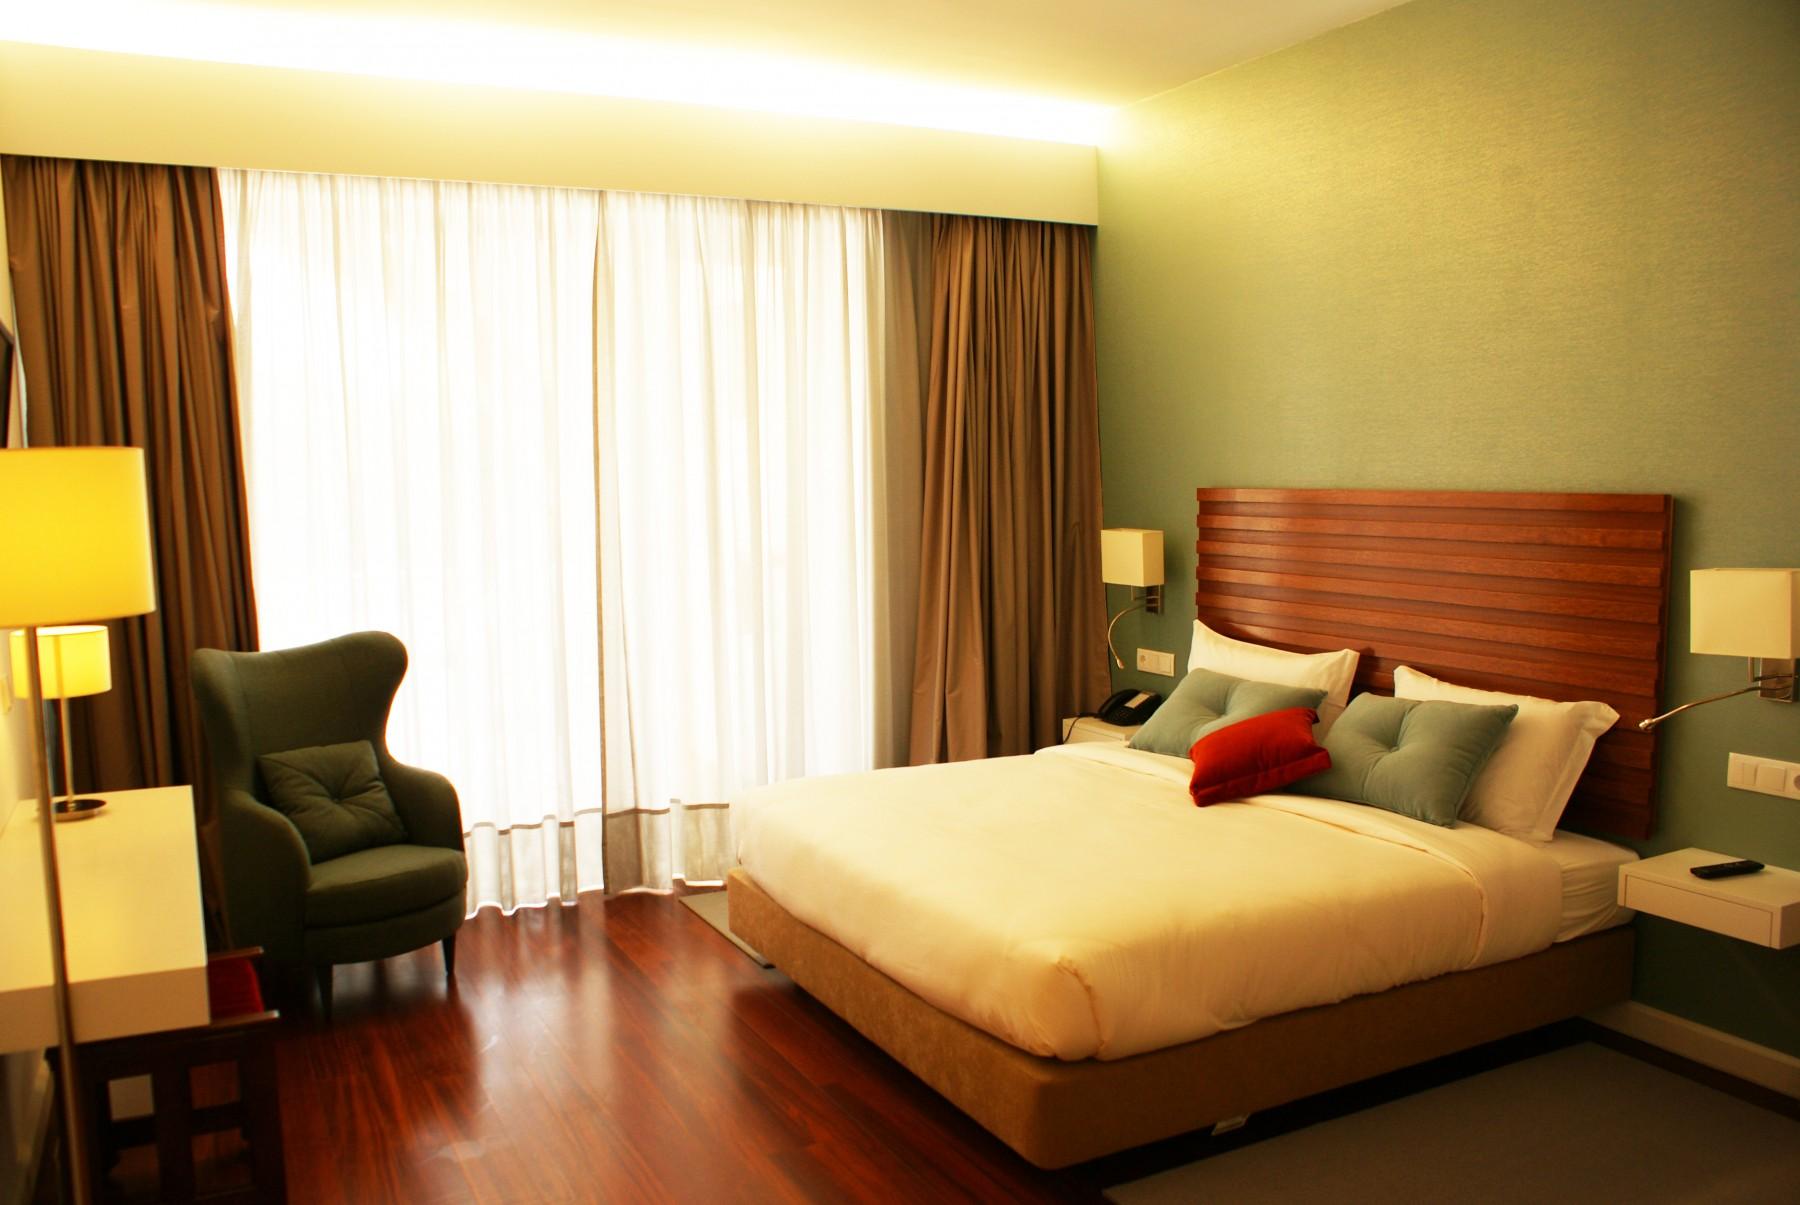 Rent By Room In Gerês Hotel S Bento Quarto Duplo Sup